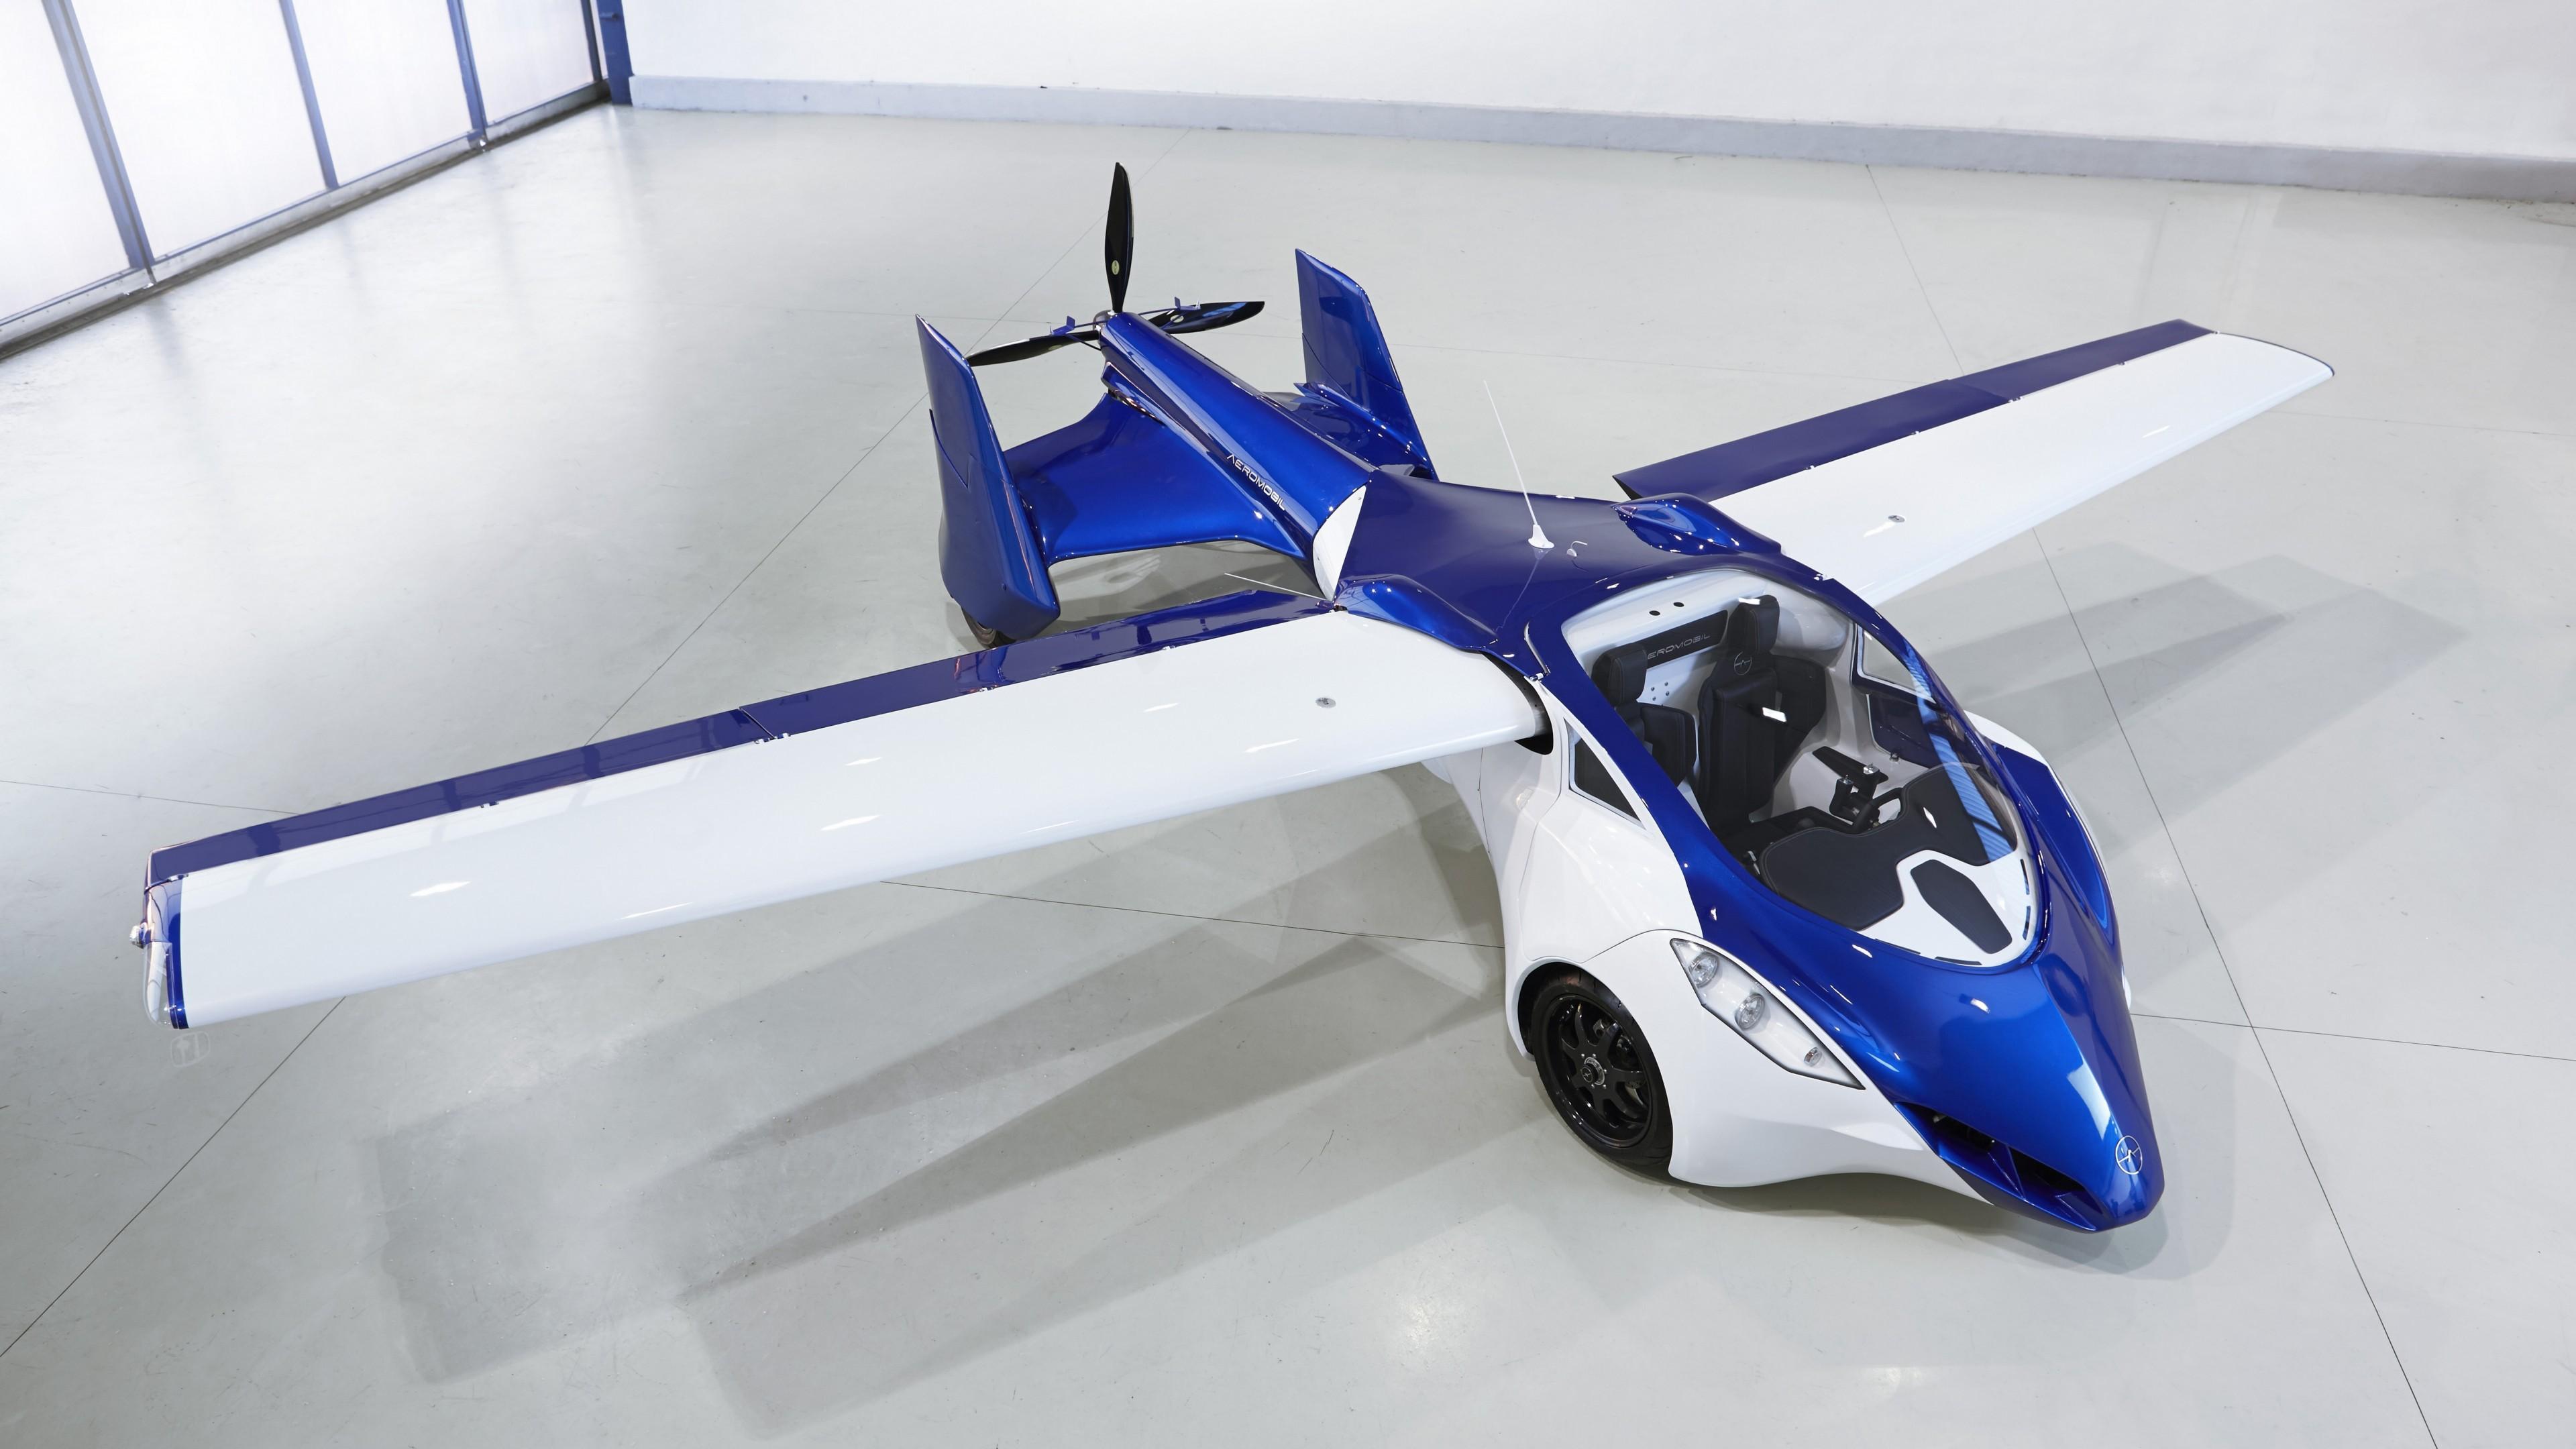 Nissan Sports Car >> Wallpaper AeroMobil 3.0, concept, car, aircraft, flying ...